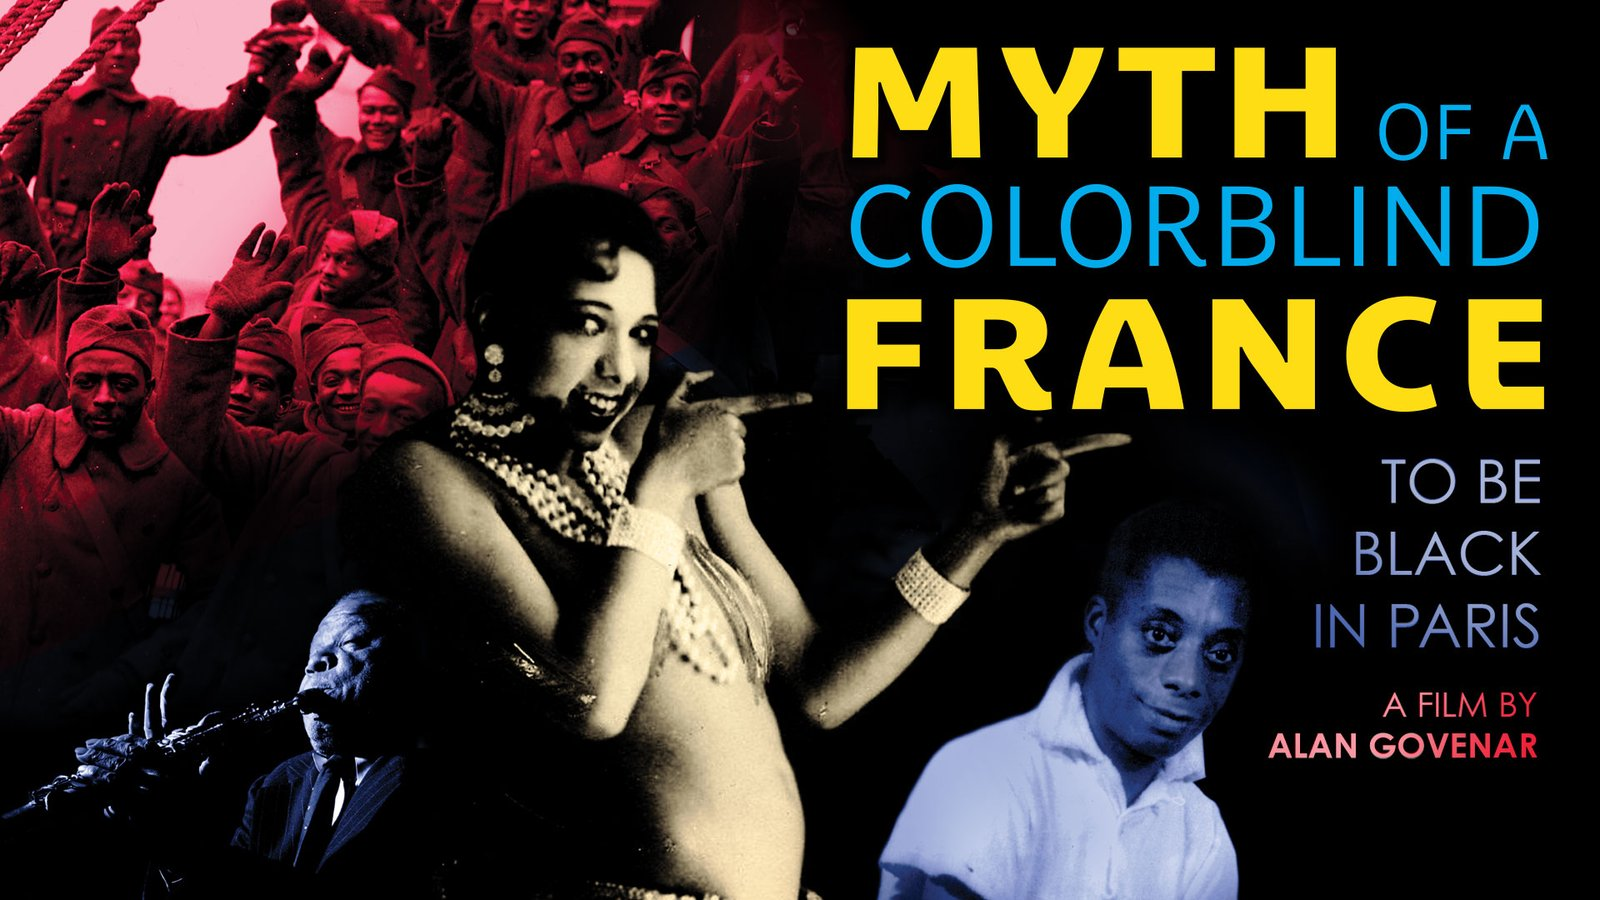 Myth of Colorblind France